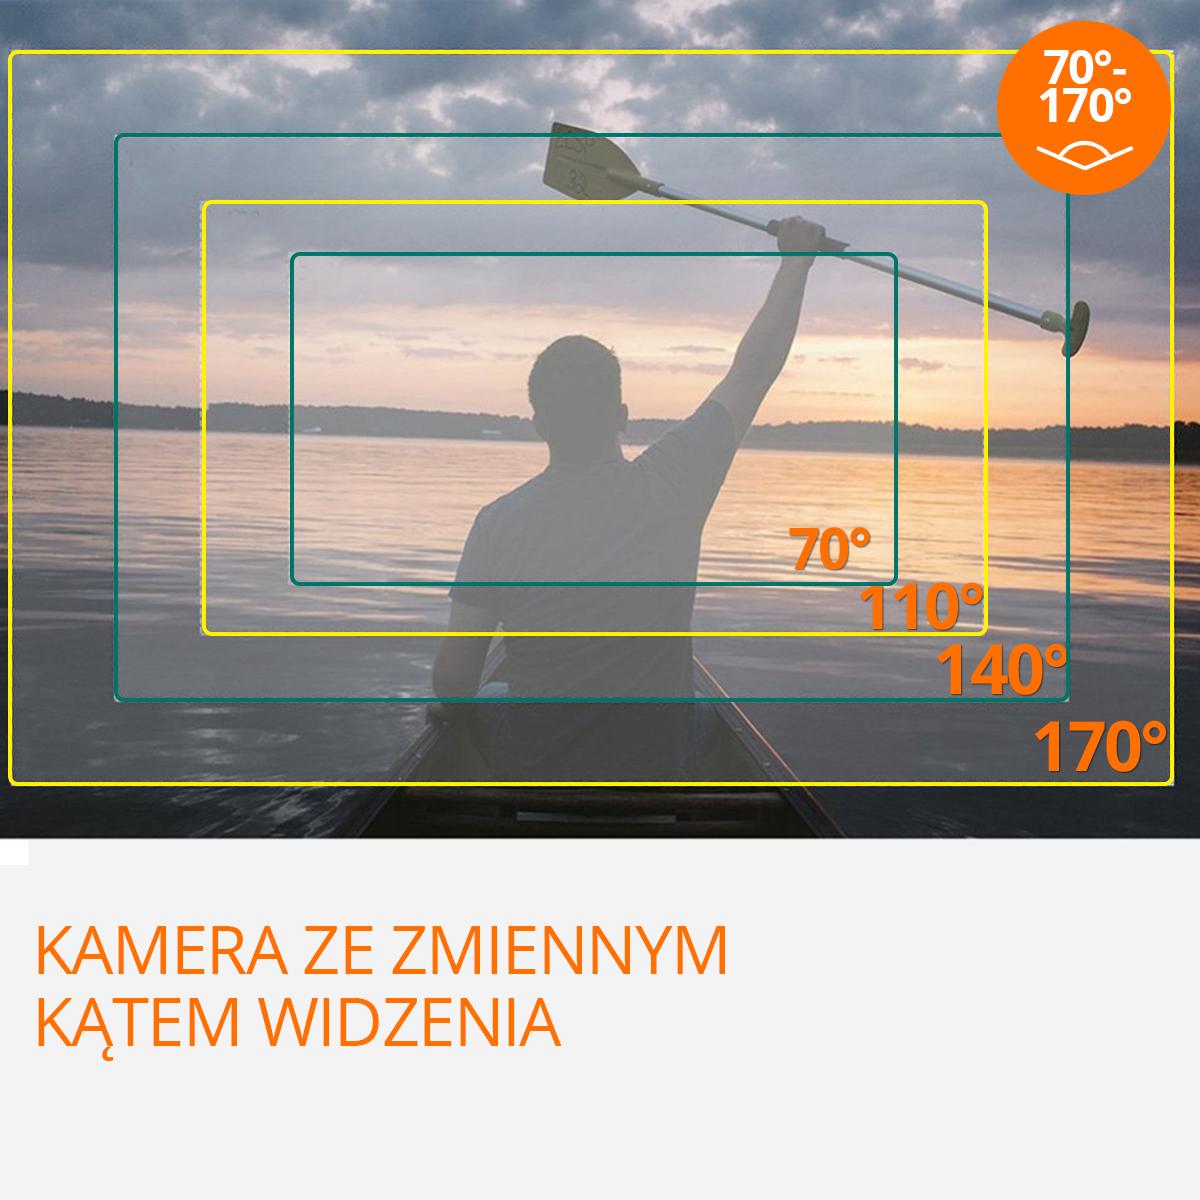 kamerka-sportowa-4k-XPRO-GO-szeroki-kat-widzenia-orllo-pl